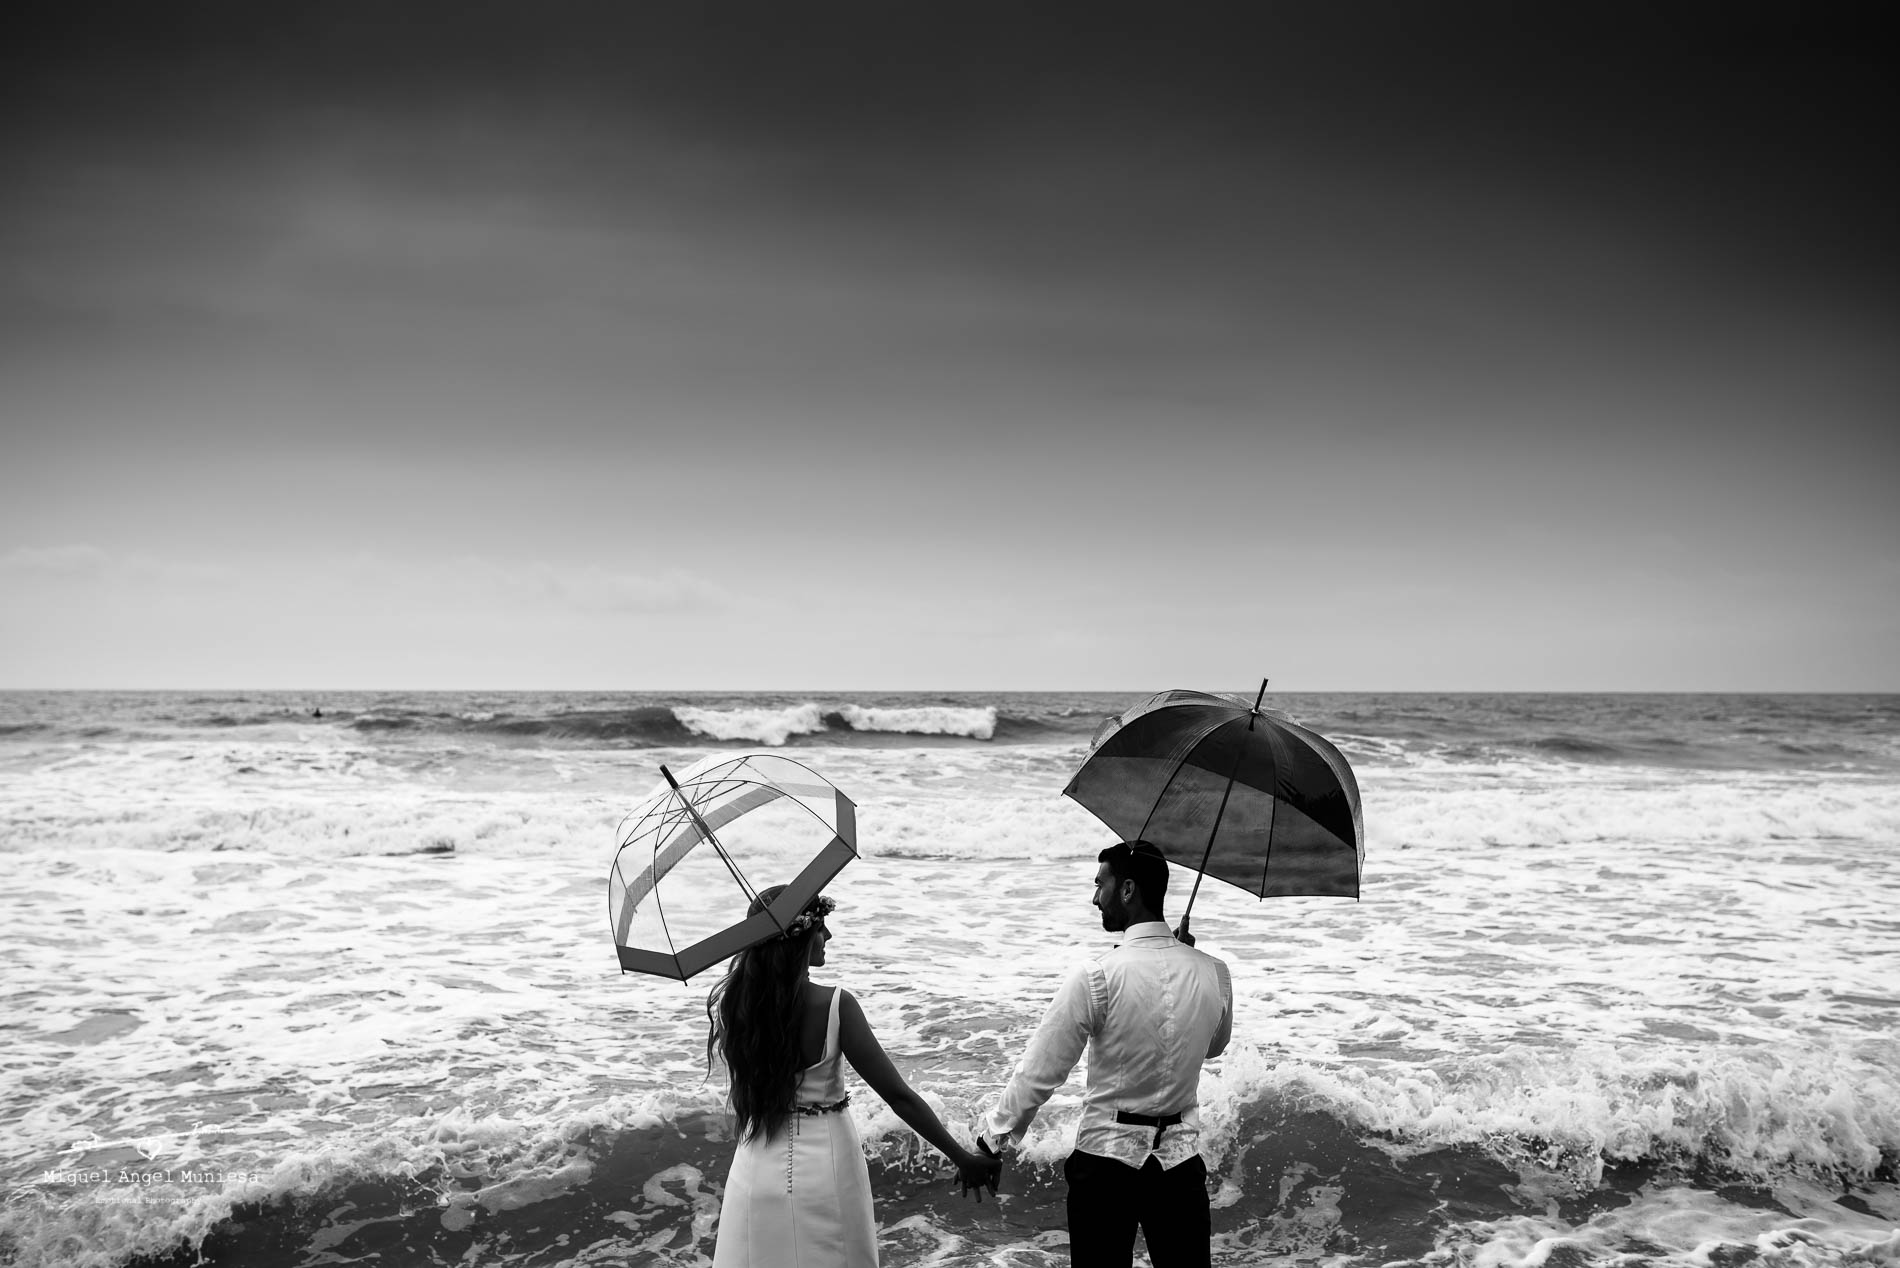 boda, fotografia de boda, boda zaragoza, fotografia, wedding, wedding photography, miguel angel muniesa, fotografo boda Zaragoza, fotografo boda, destination wedding_ 0015